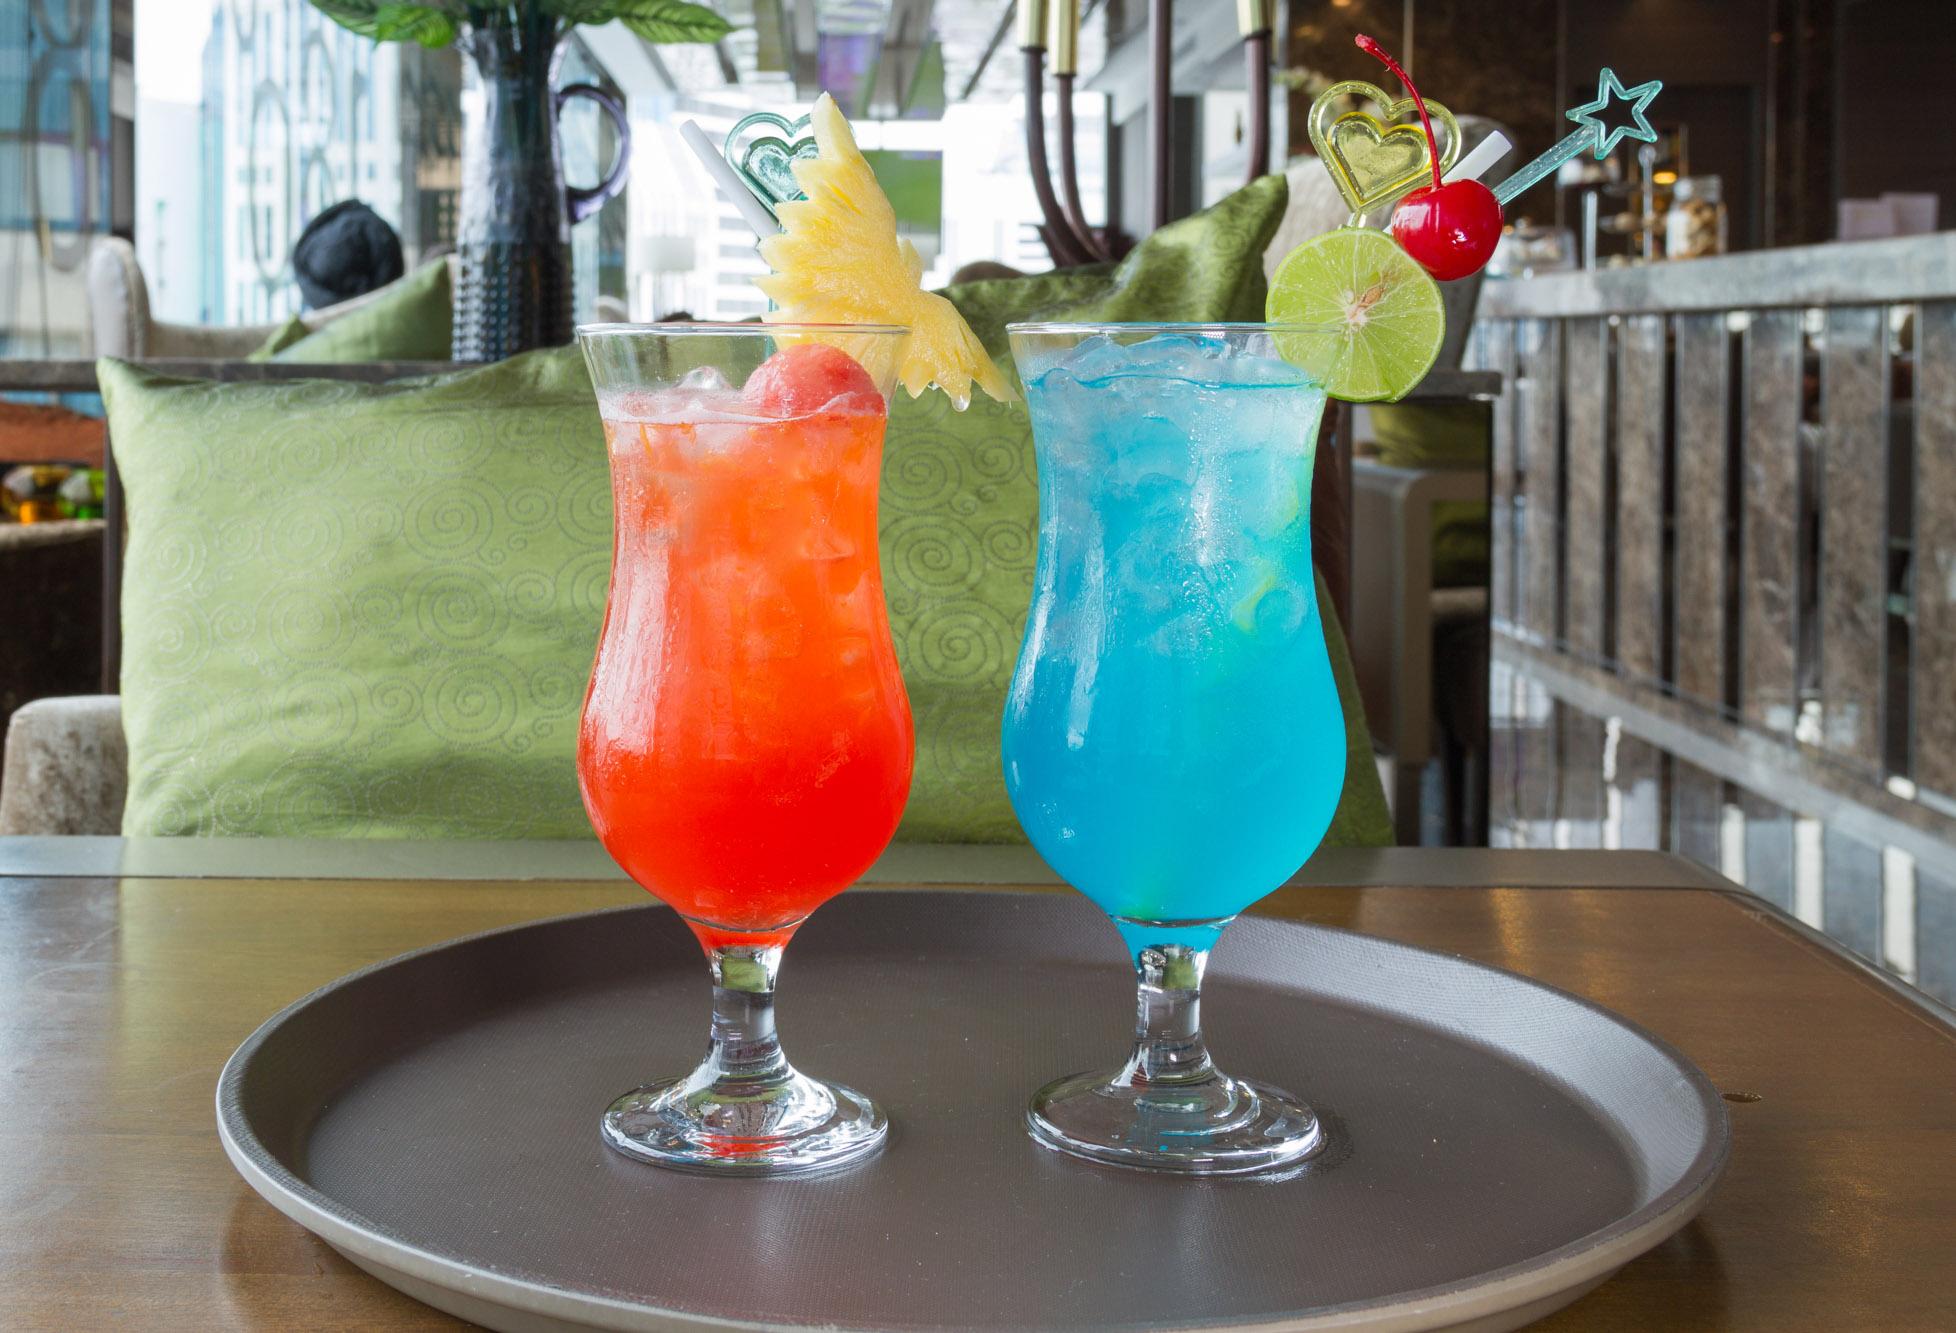 Tropic Mania Grand Swiss Hotel Sukhumvit 11  180 Sky Lounge โรงแรมแกรนด์สวิส สุขุมวิท 11 IMG 7706